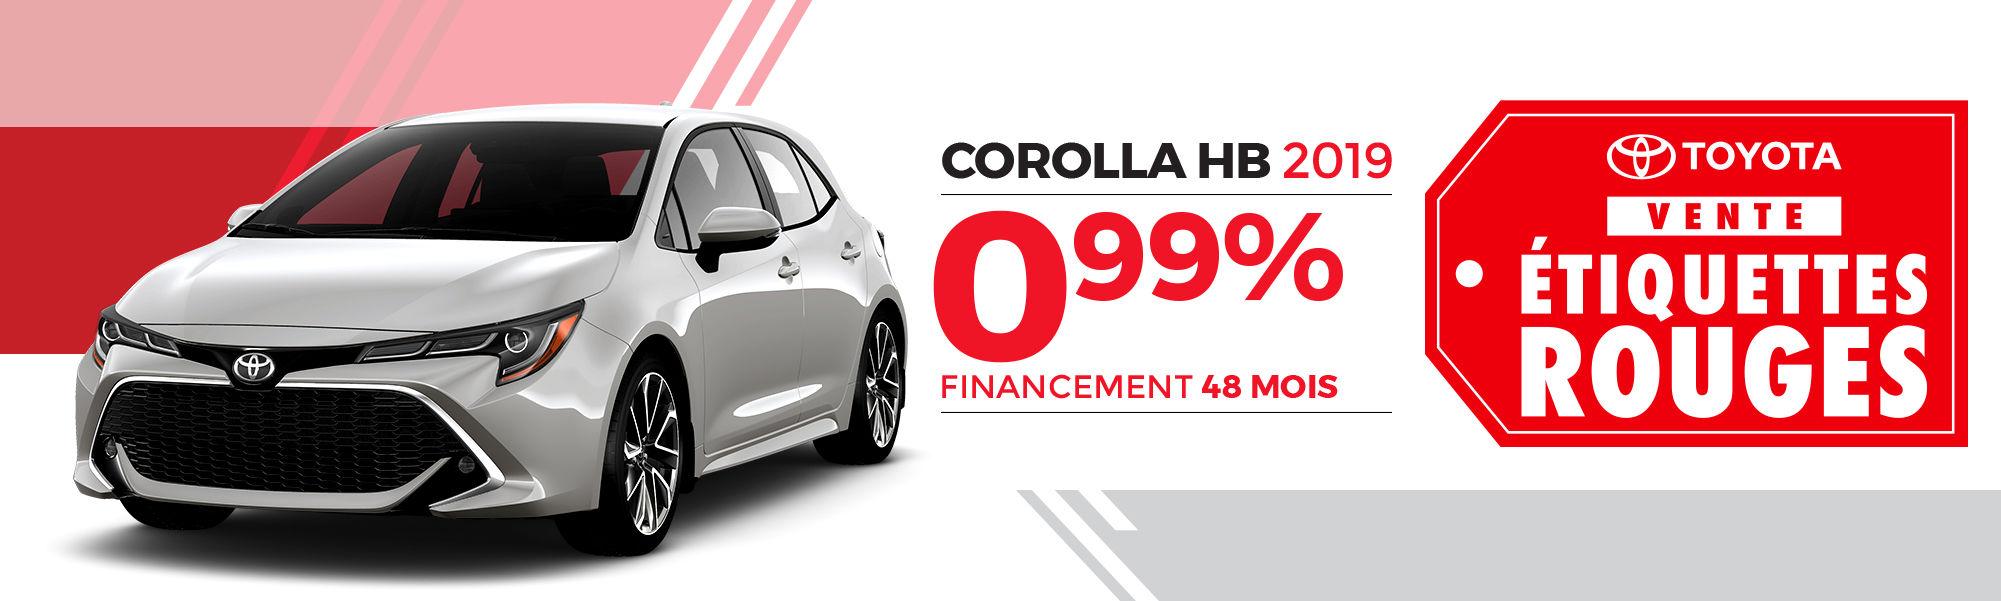 COROLLA HB 2019